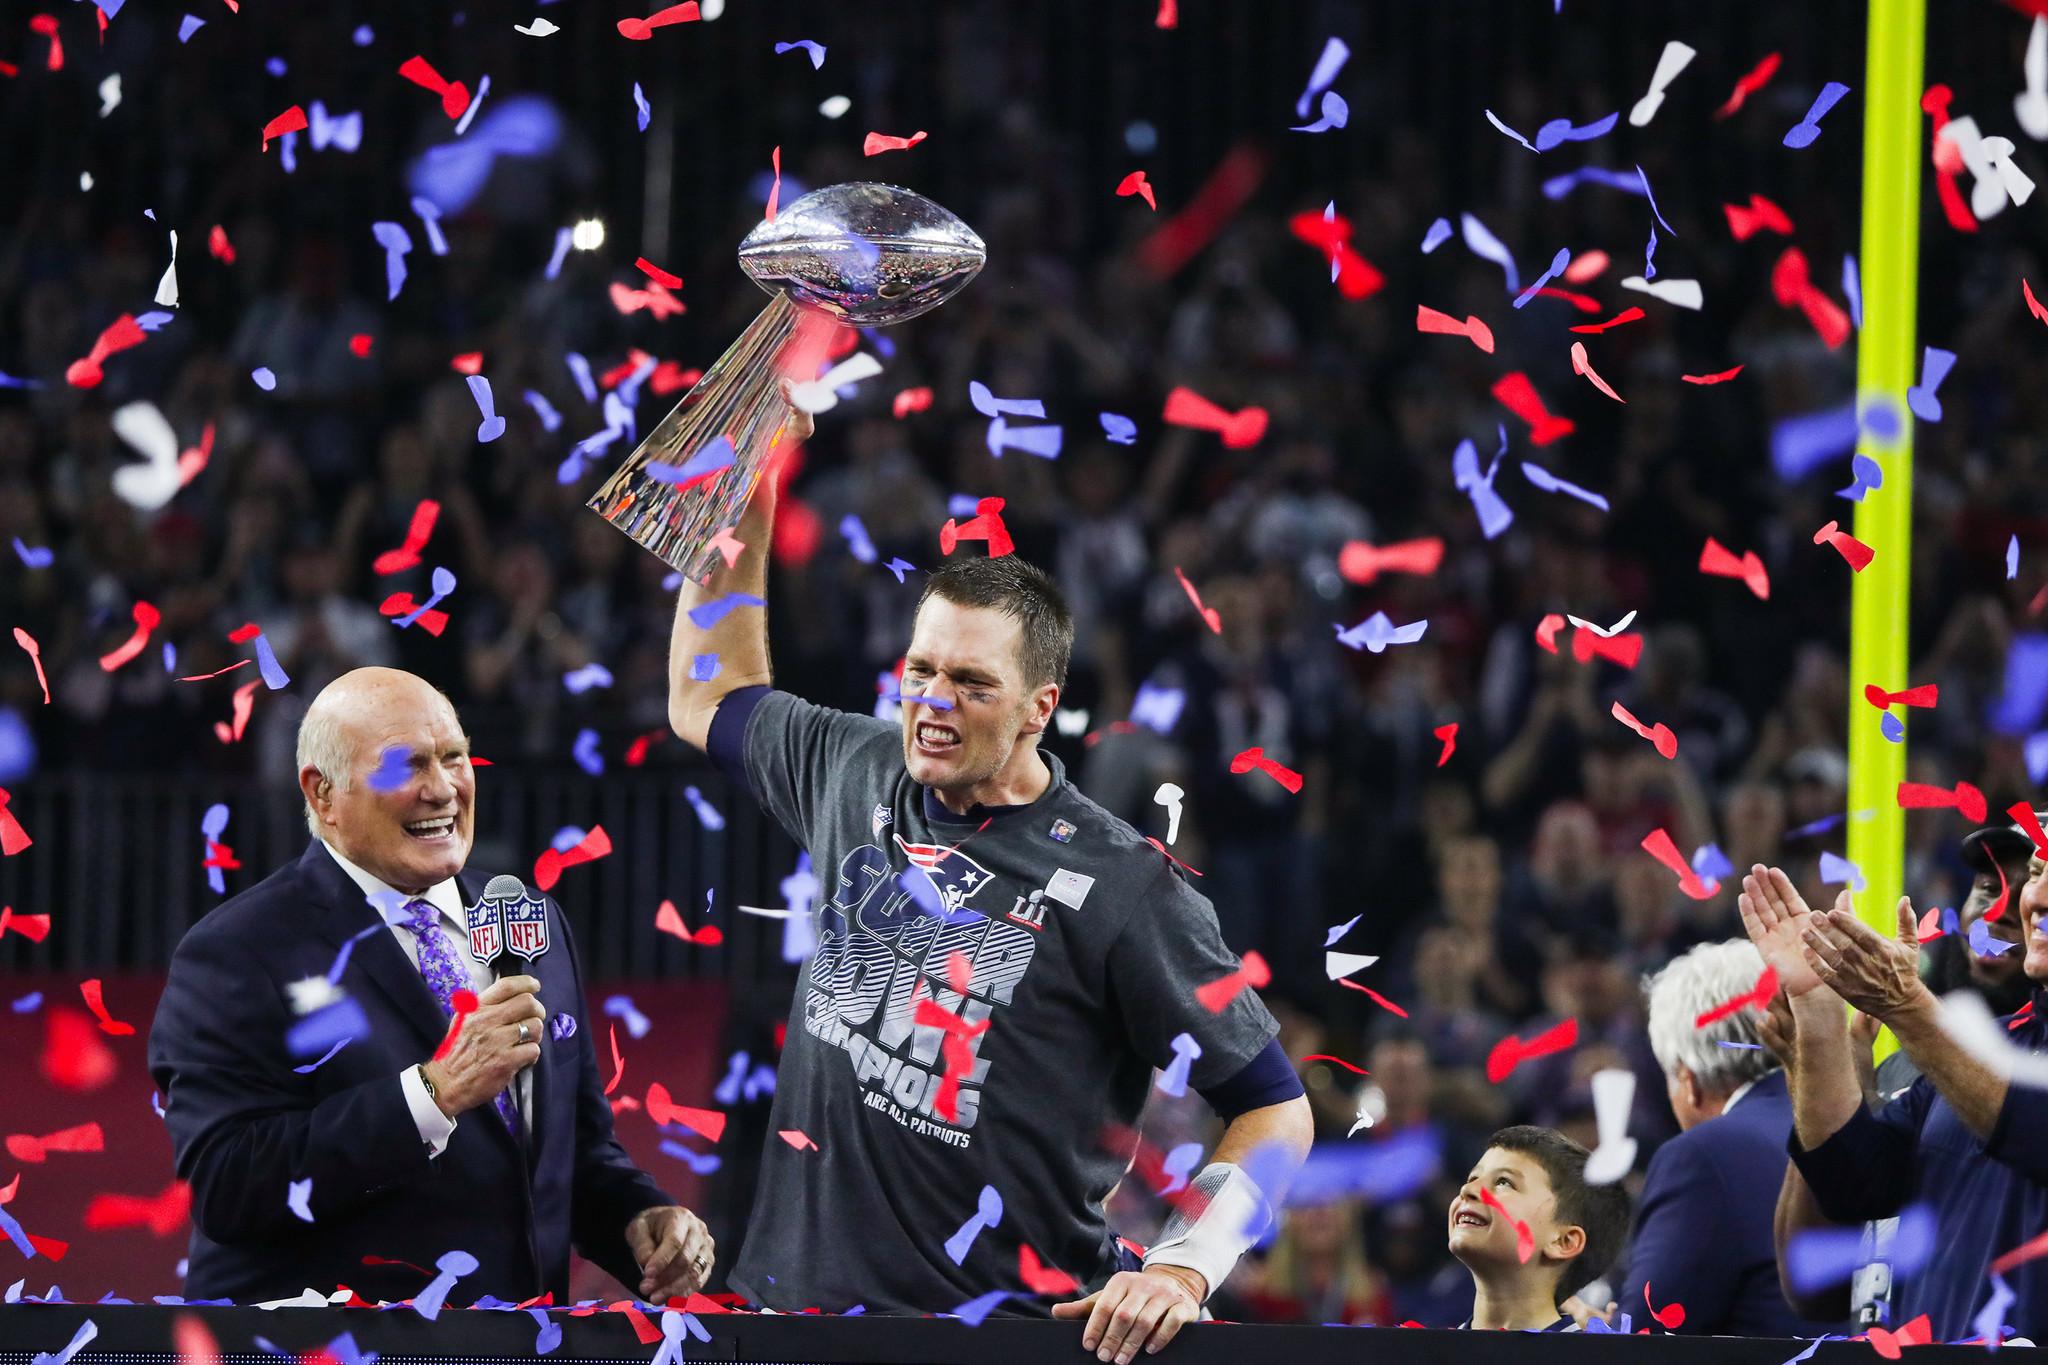 Super Bowl XXXIII